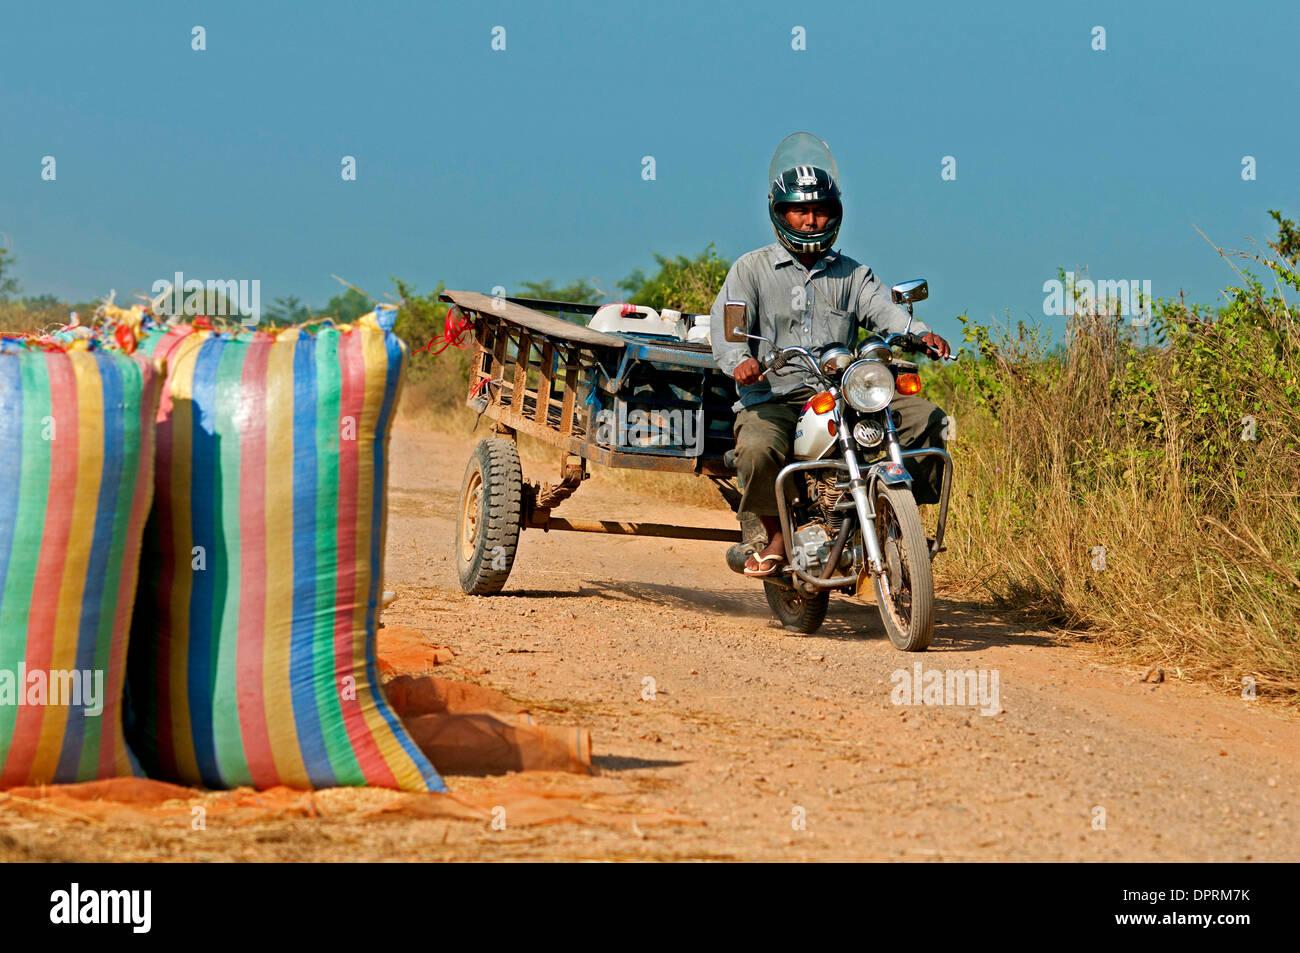 Man on motorbike on a country road near Battambang passing rice bags, Battambang, Cambodia - Stock Image